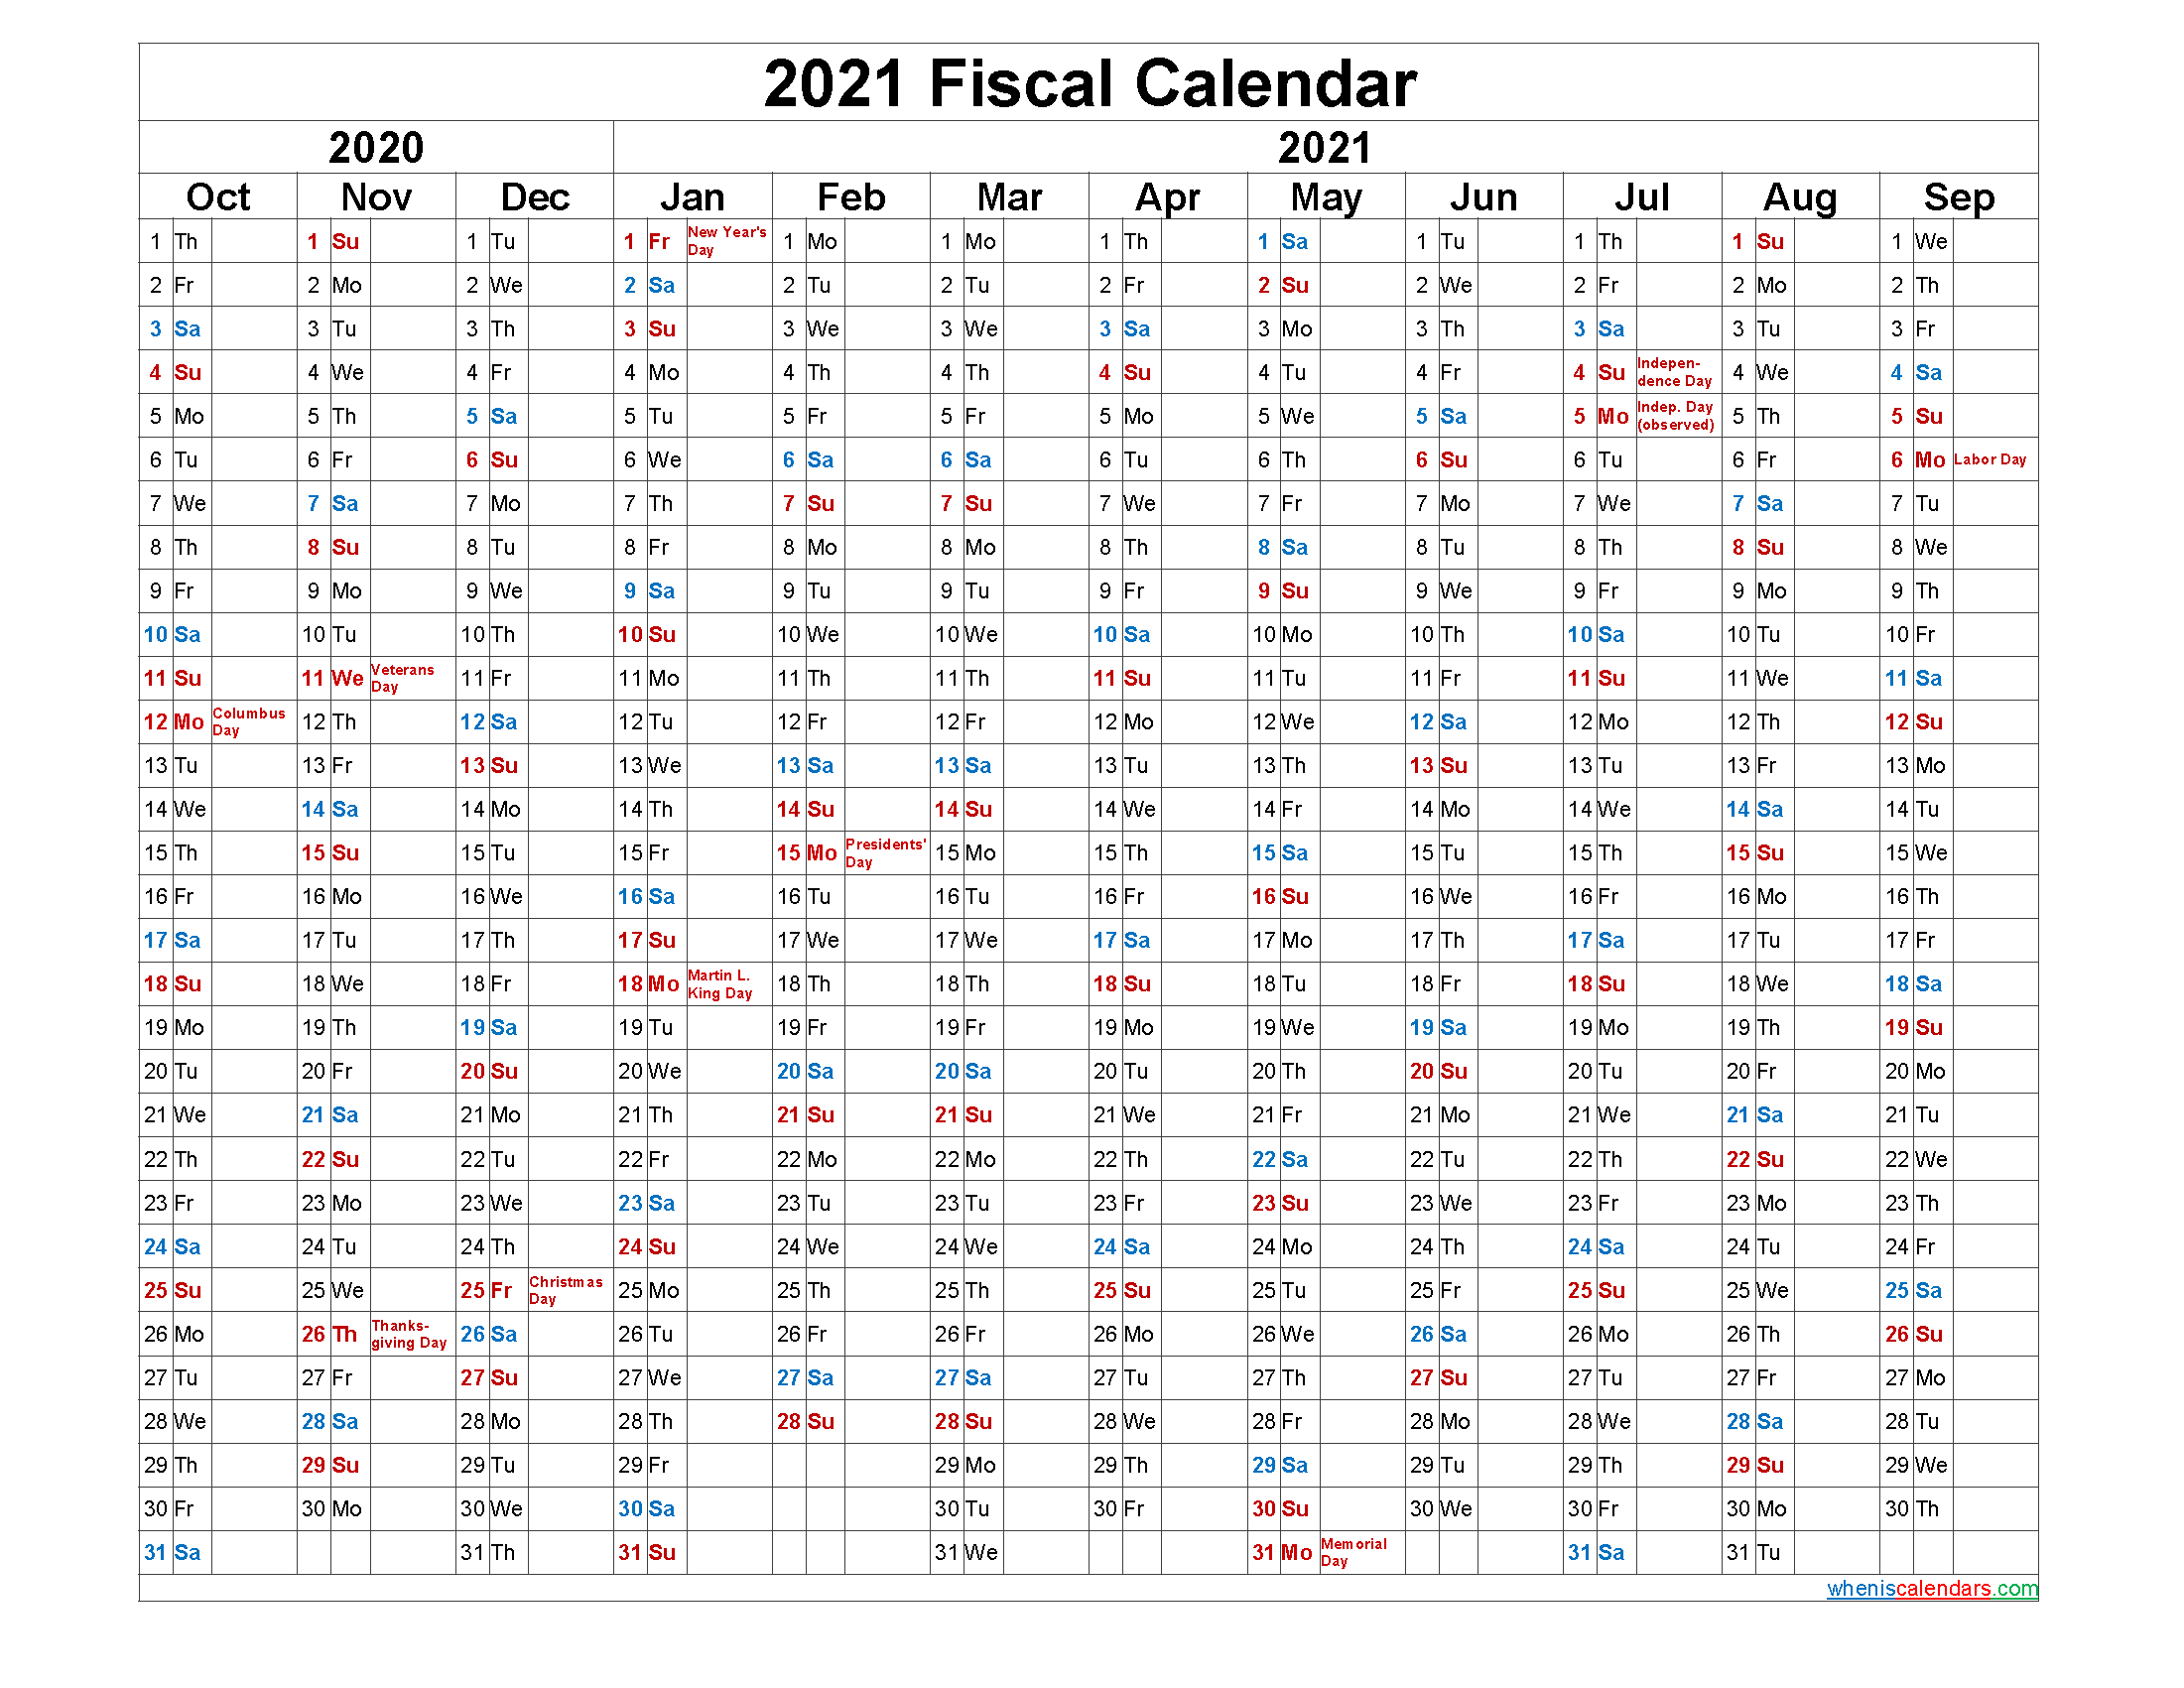 Fiscal Year Calendar 2021